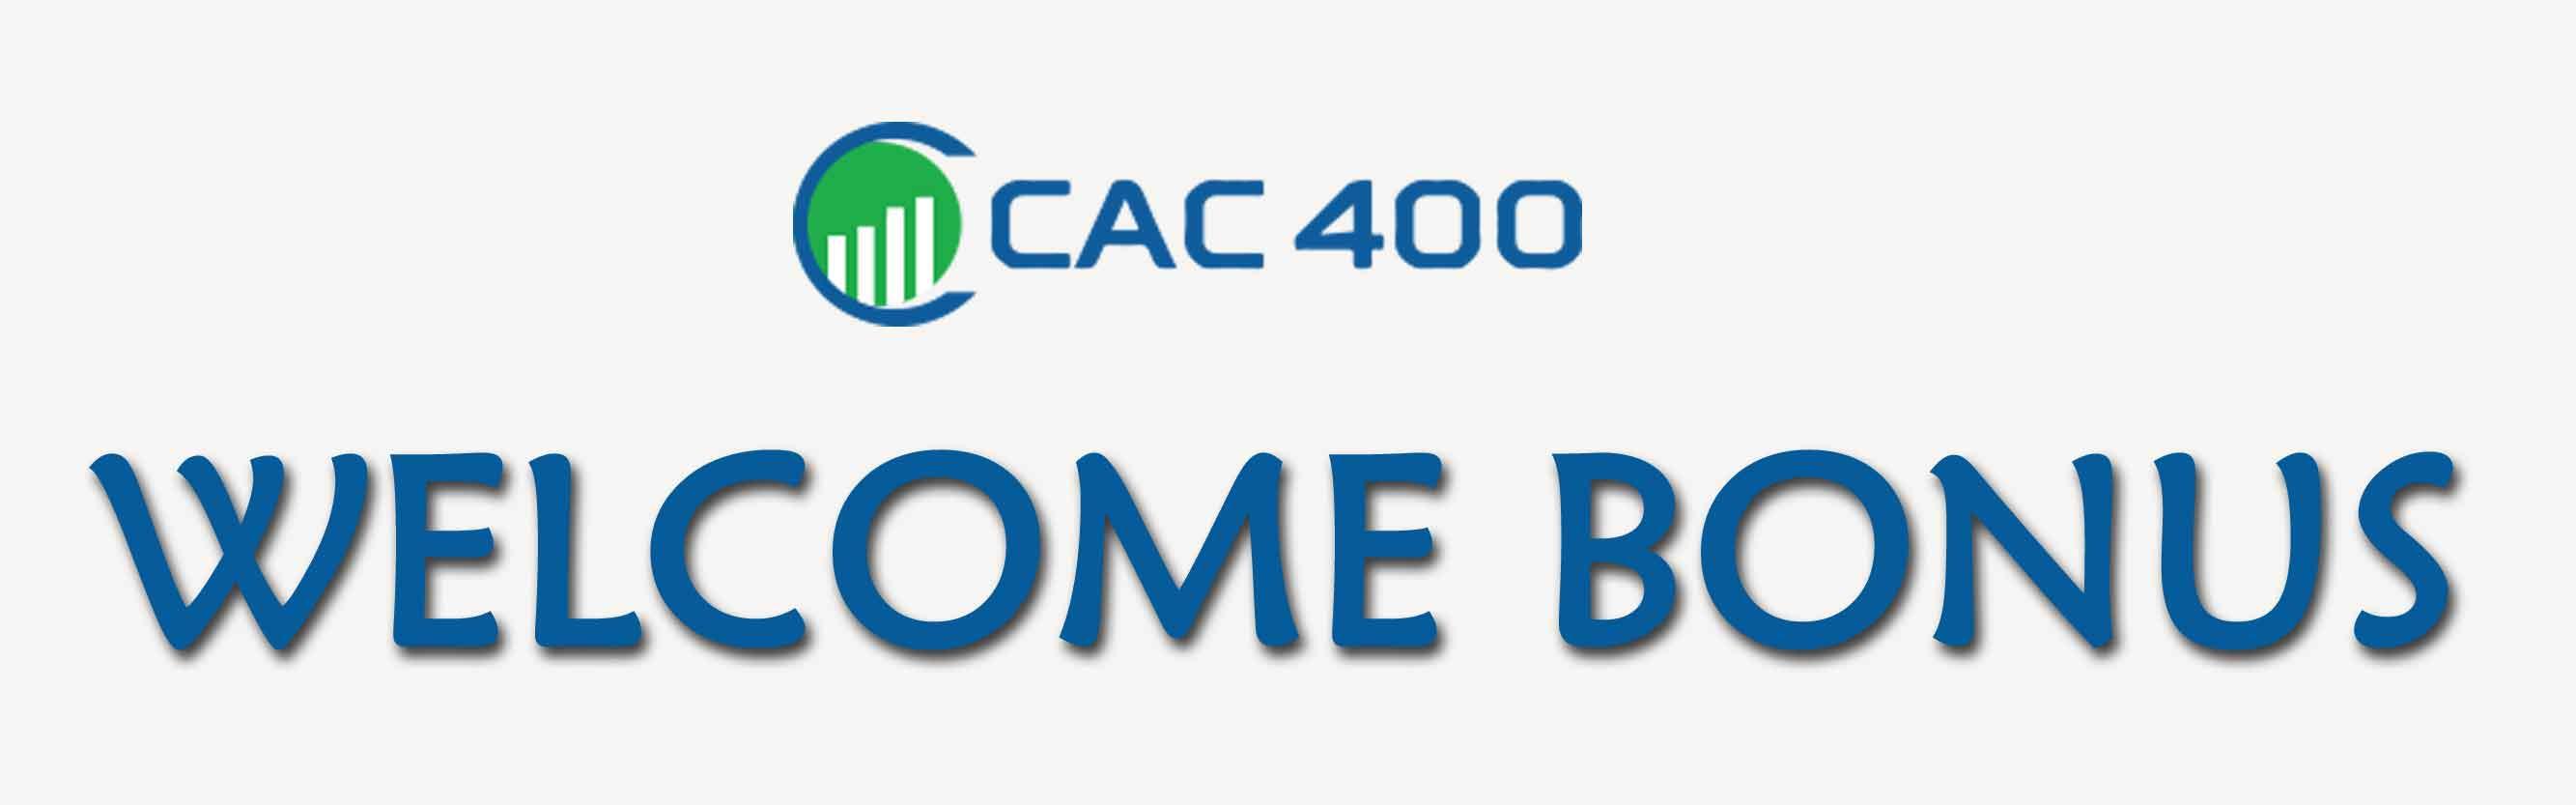 cac400 Welcome Bonus